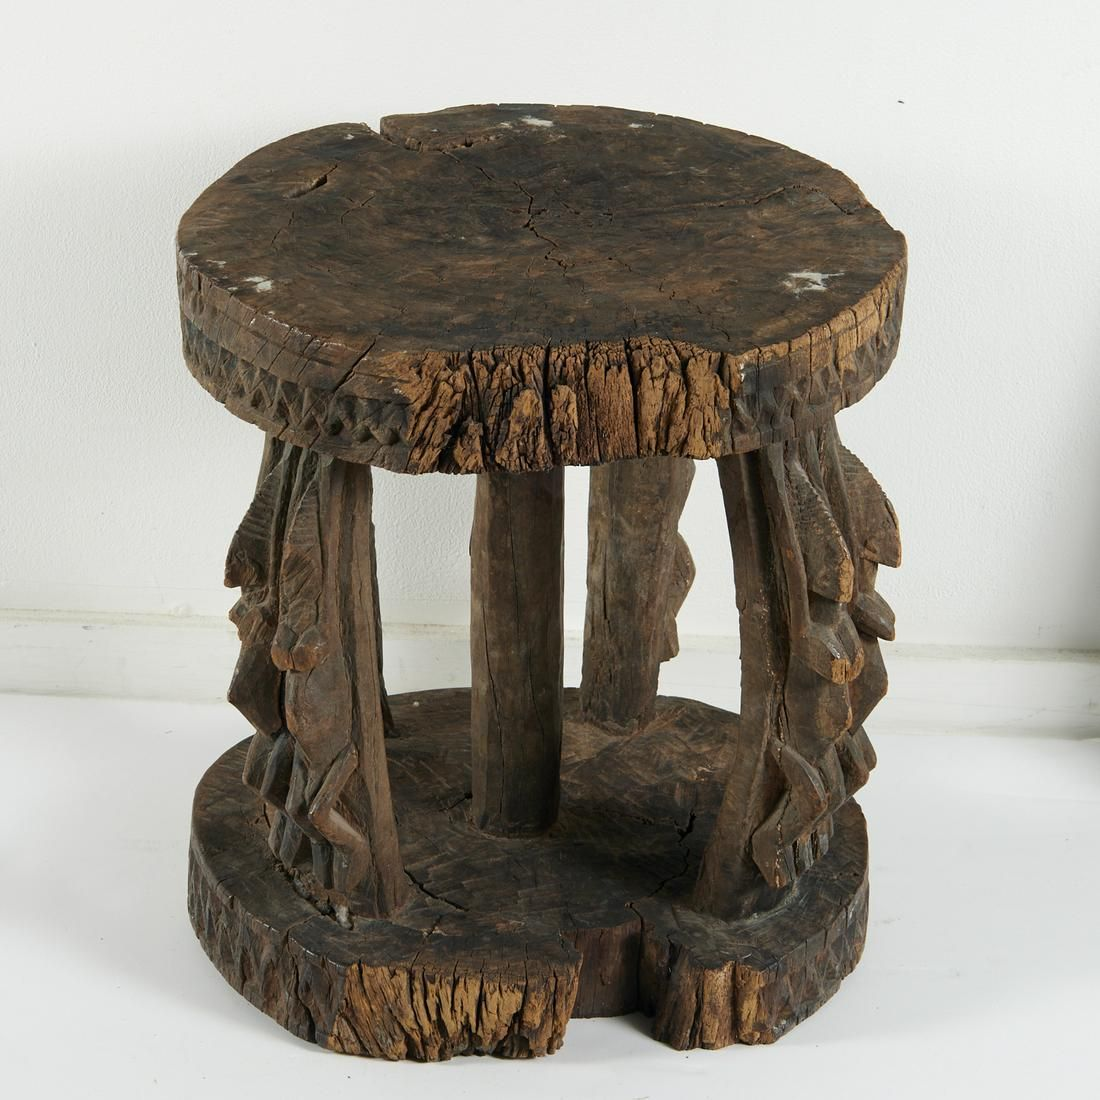 Dogon carved wood ritual stool, ex-Parke-Bernet